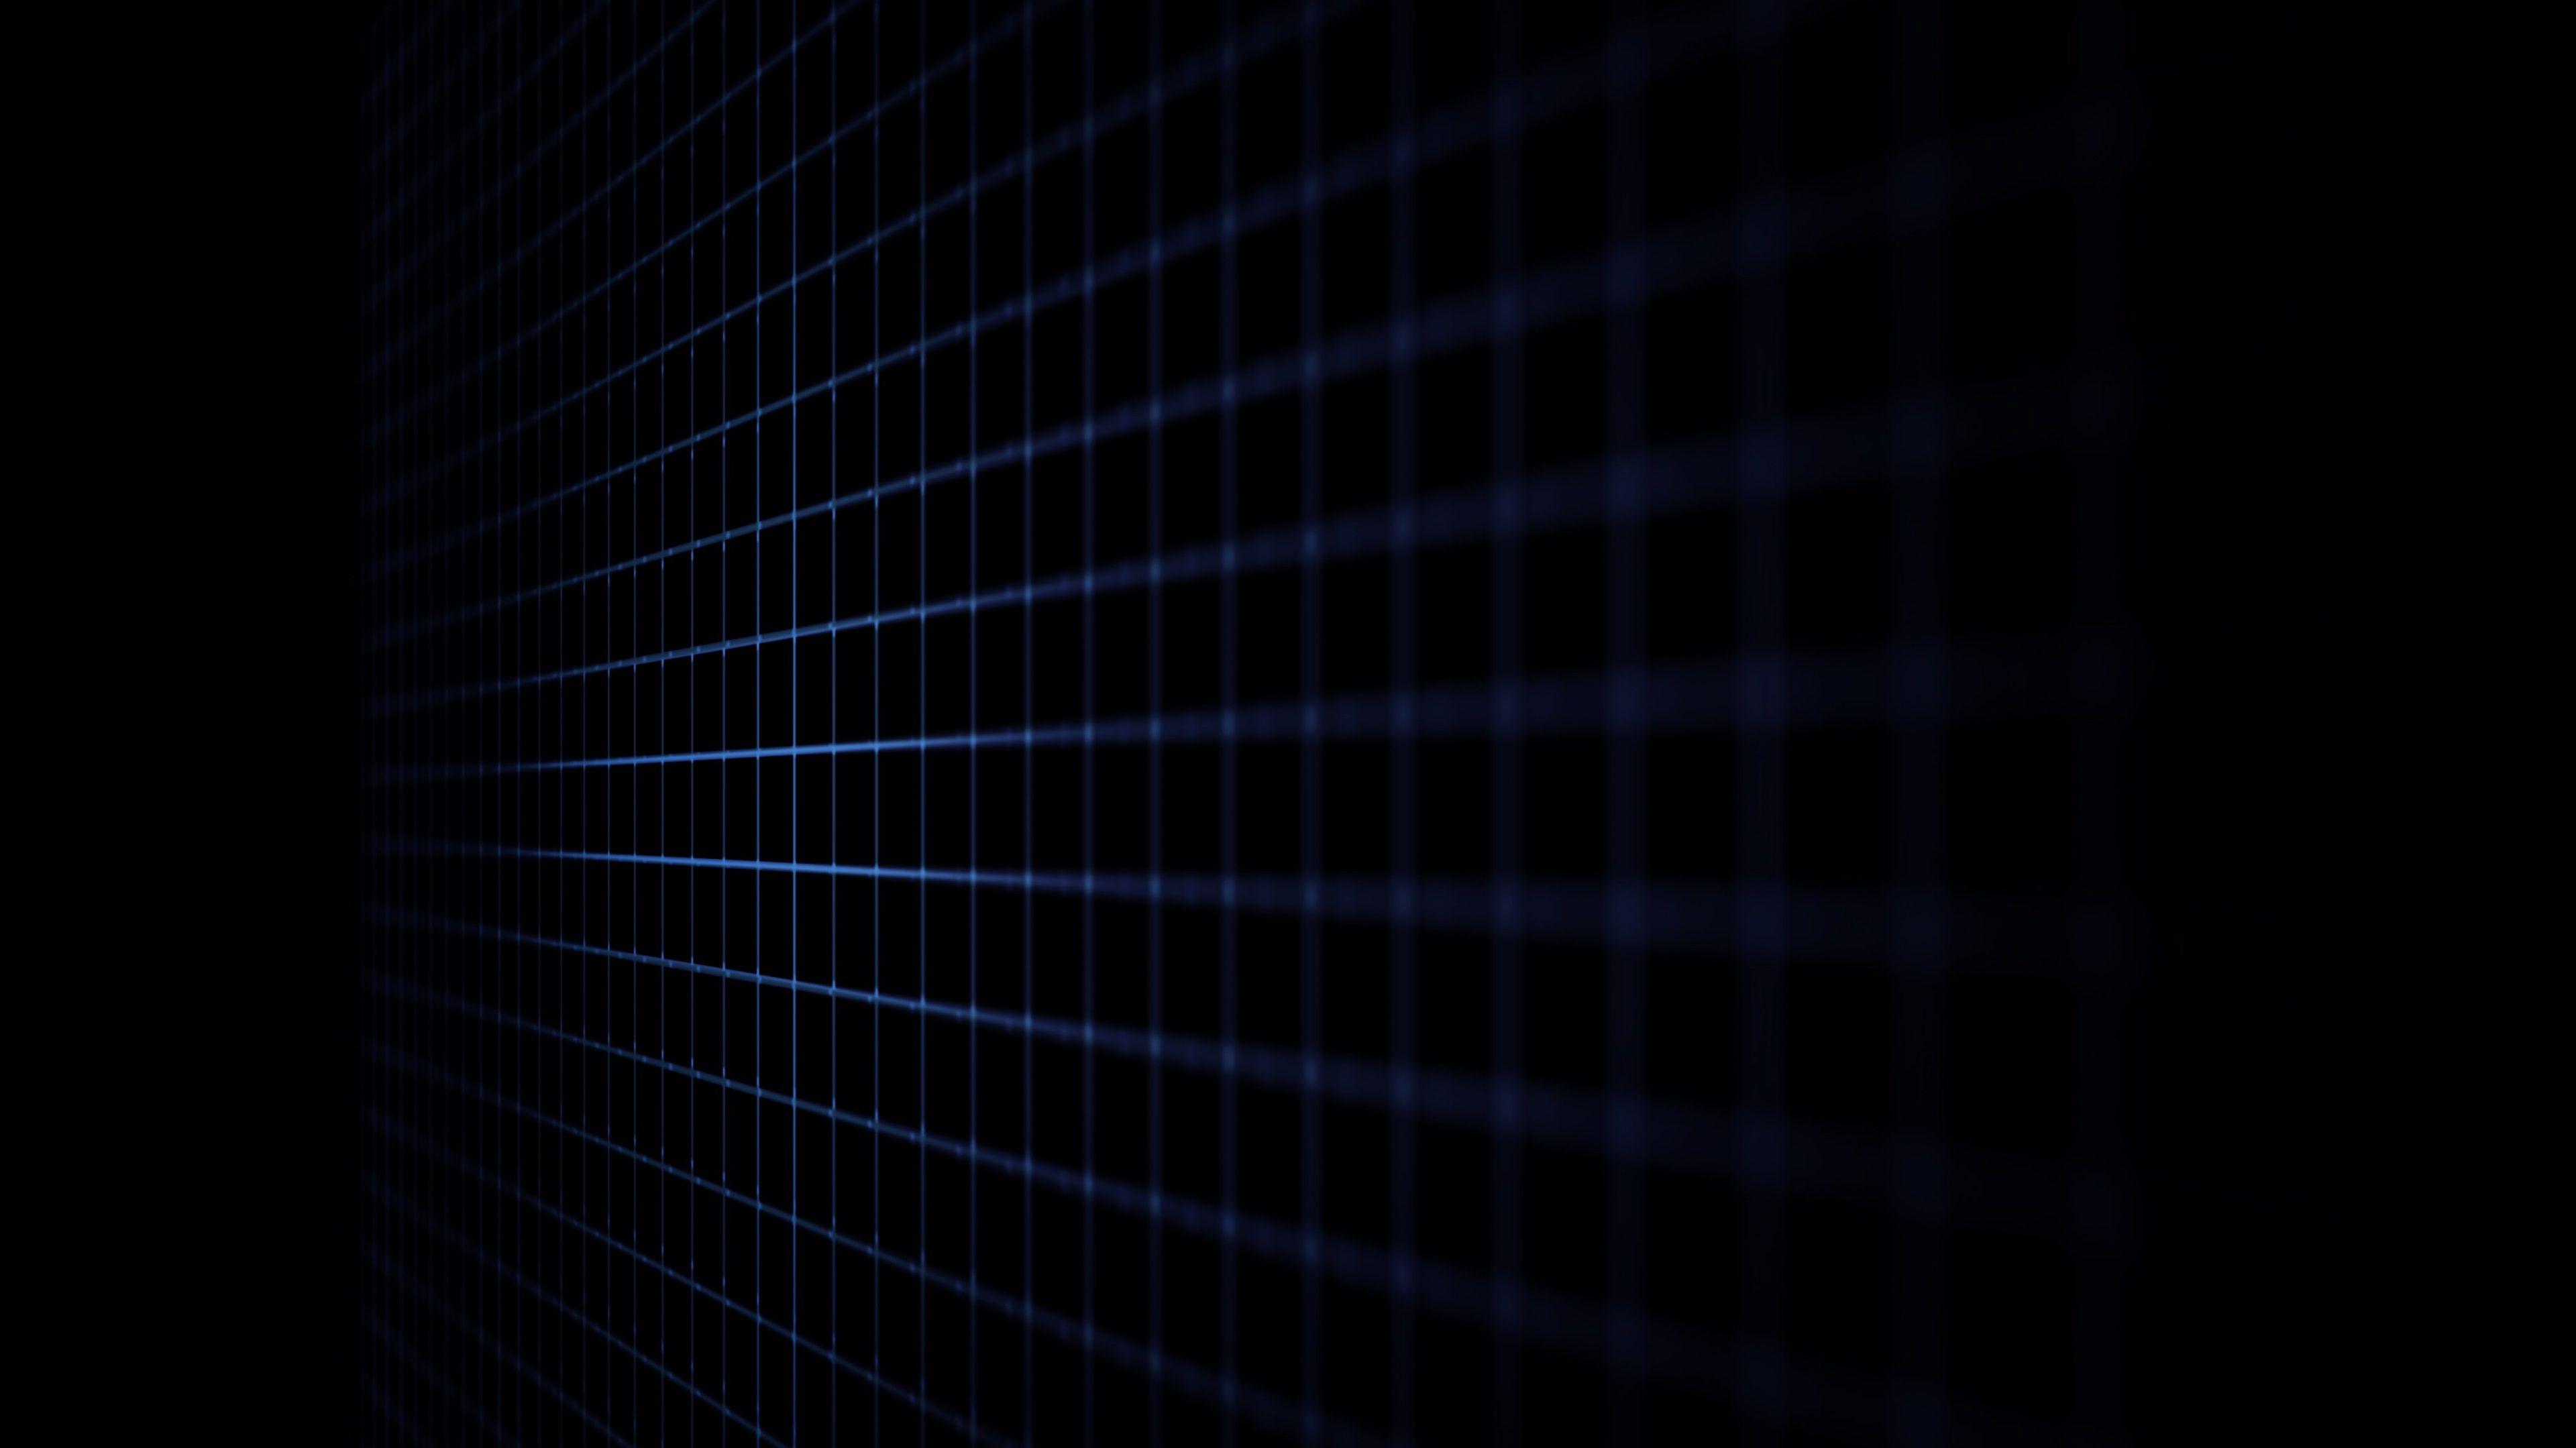 3840x2159 Grid Lines 4k Wallpaper In Hd Quality Black Wallpaper Cool Black Wallpaper Dark Wallpaper